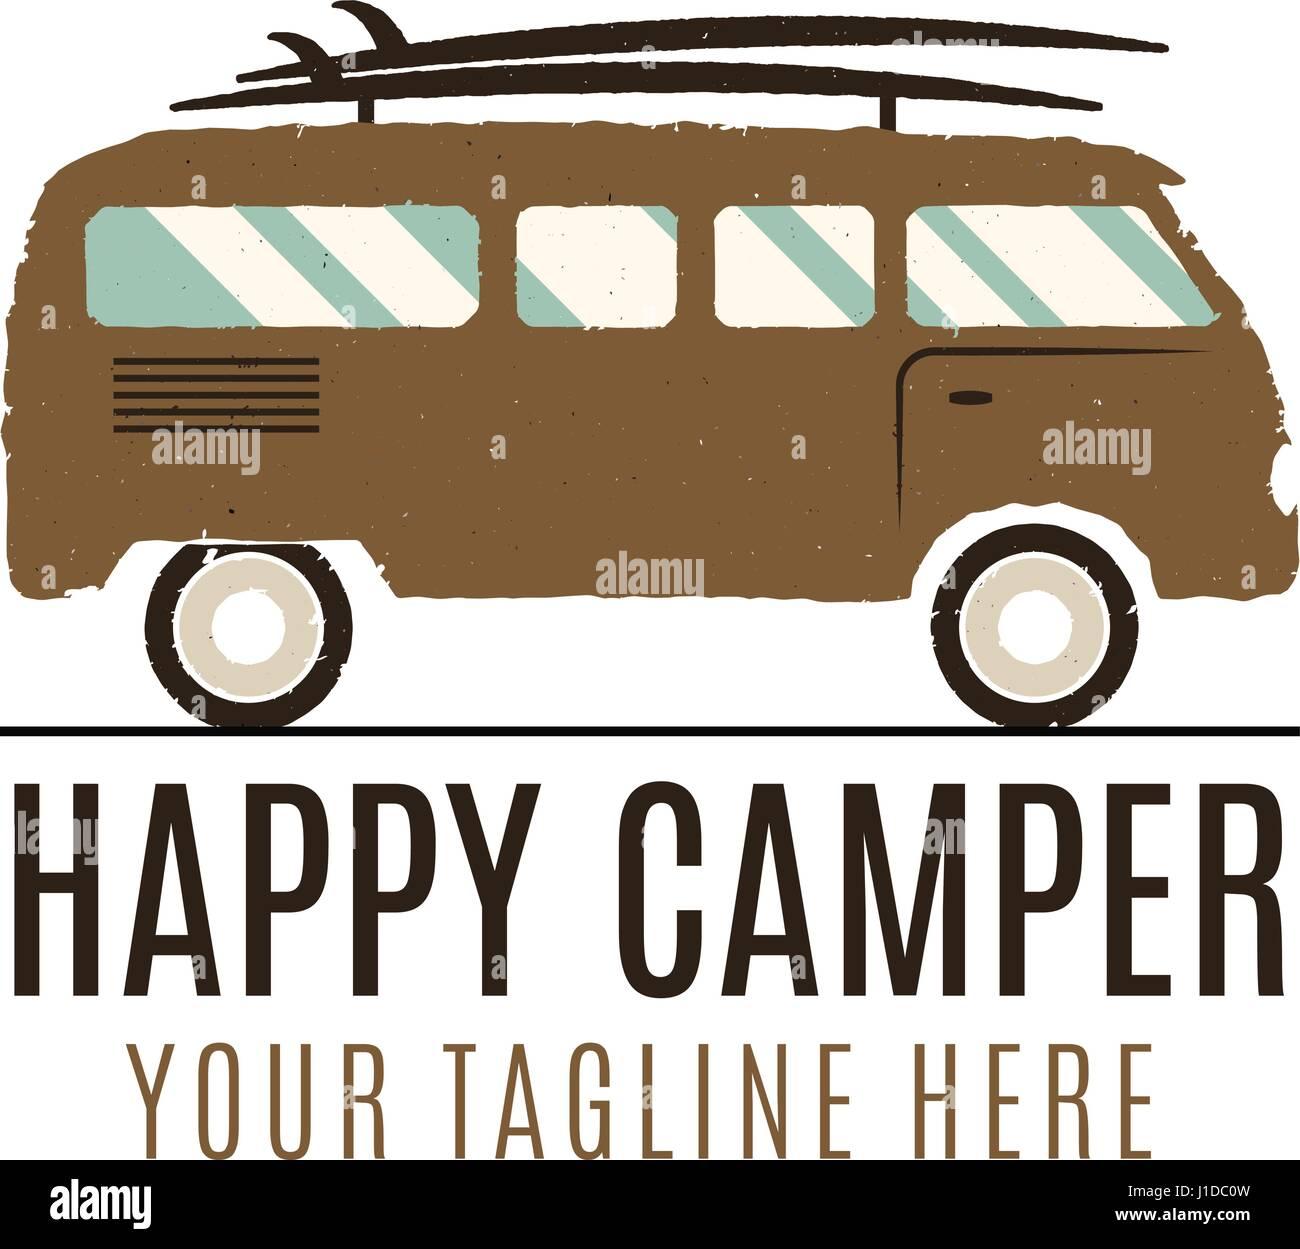 Happy camper logo design. Vintage bus illustration. RV truck emblem. Van icon template. Surfing equipment. Caravan Stock Vector